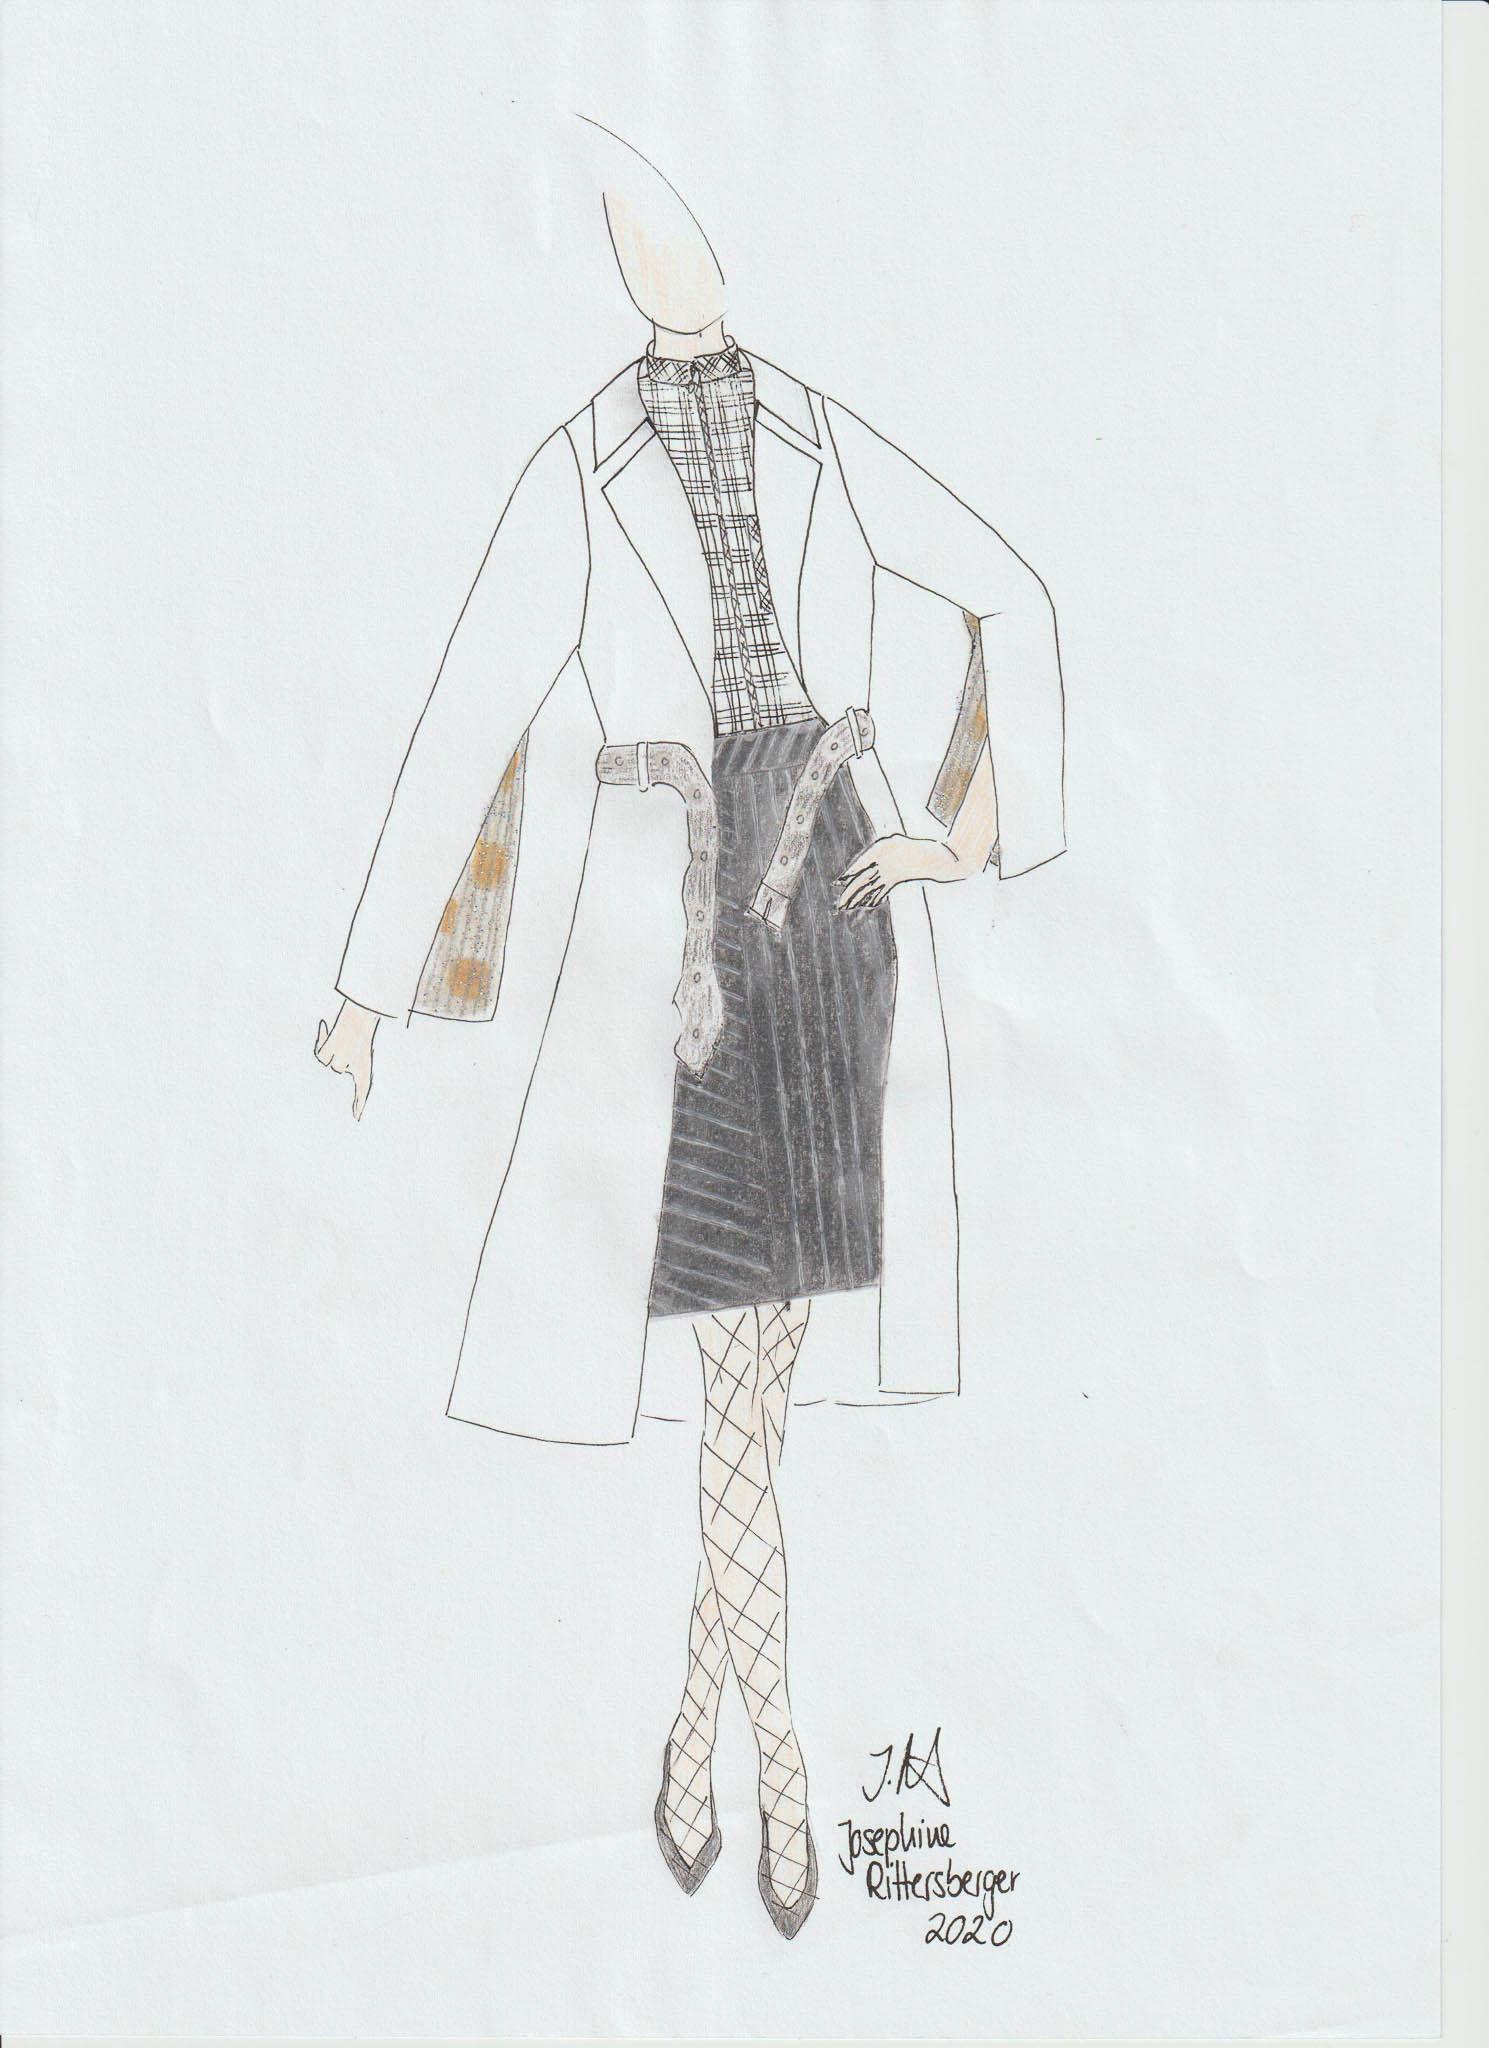 No Title: Josephine Rittersberger, Germany, Student, Modeinstitut Gabriel (Cradle to Cradle)